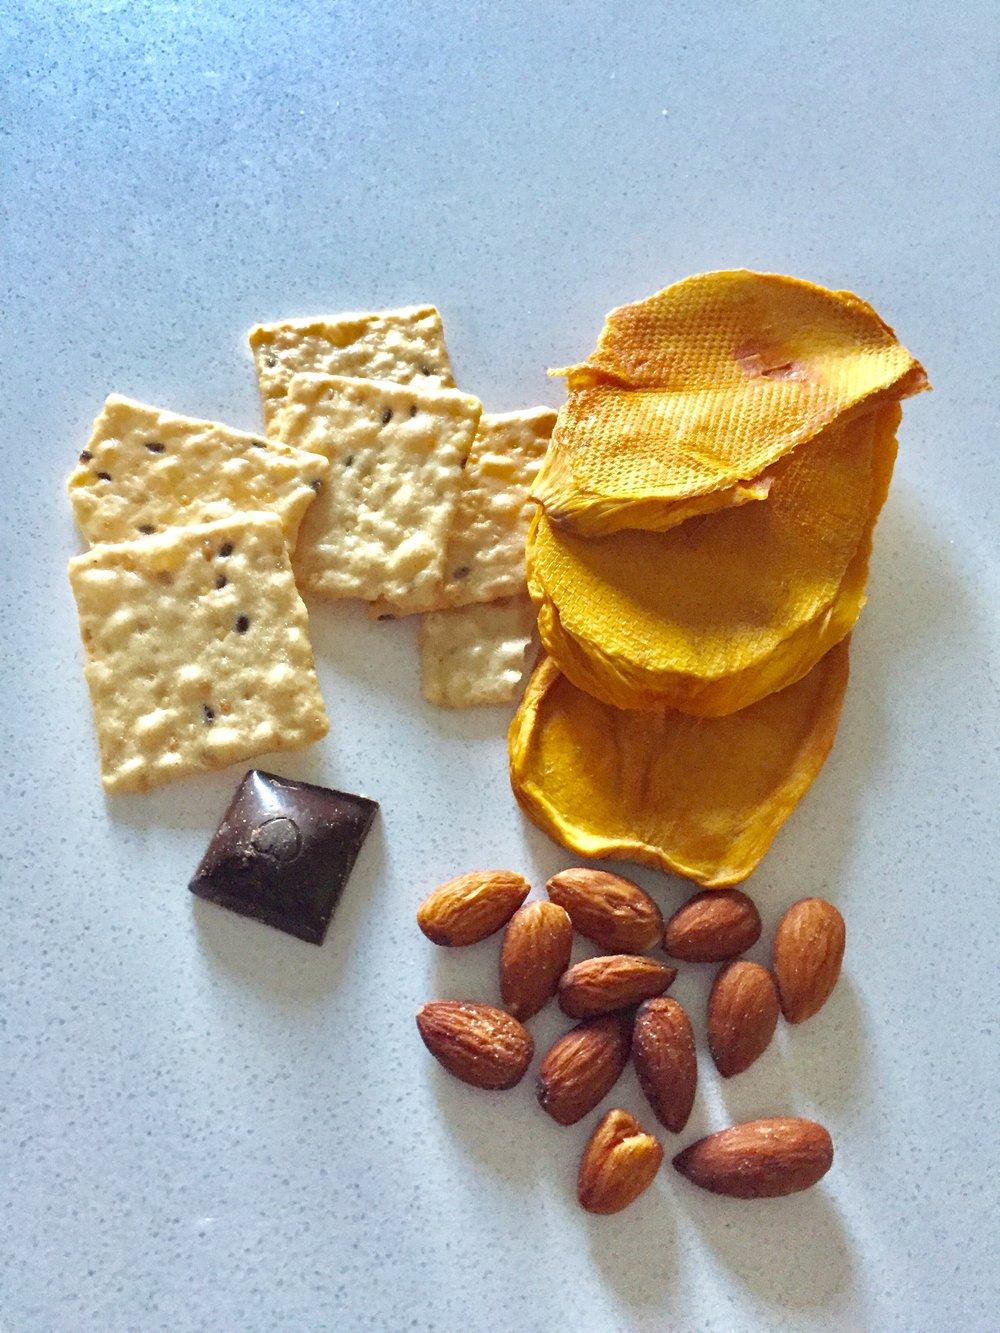 Snack: Rice crackers, dry mango, nuts, dark chocolate.